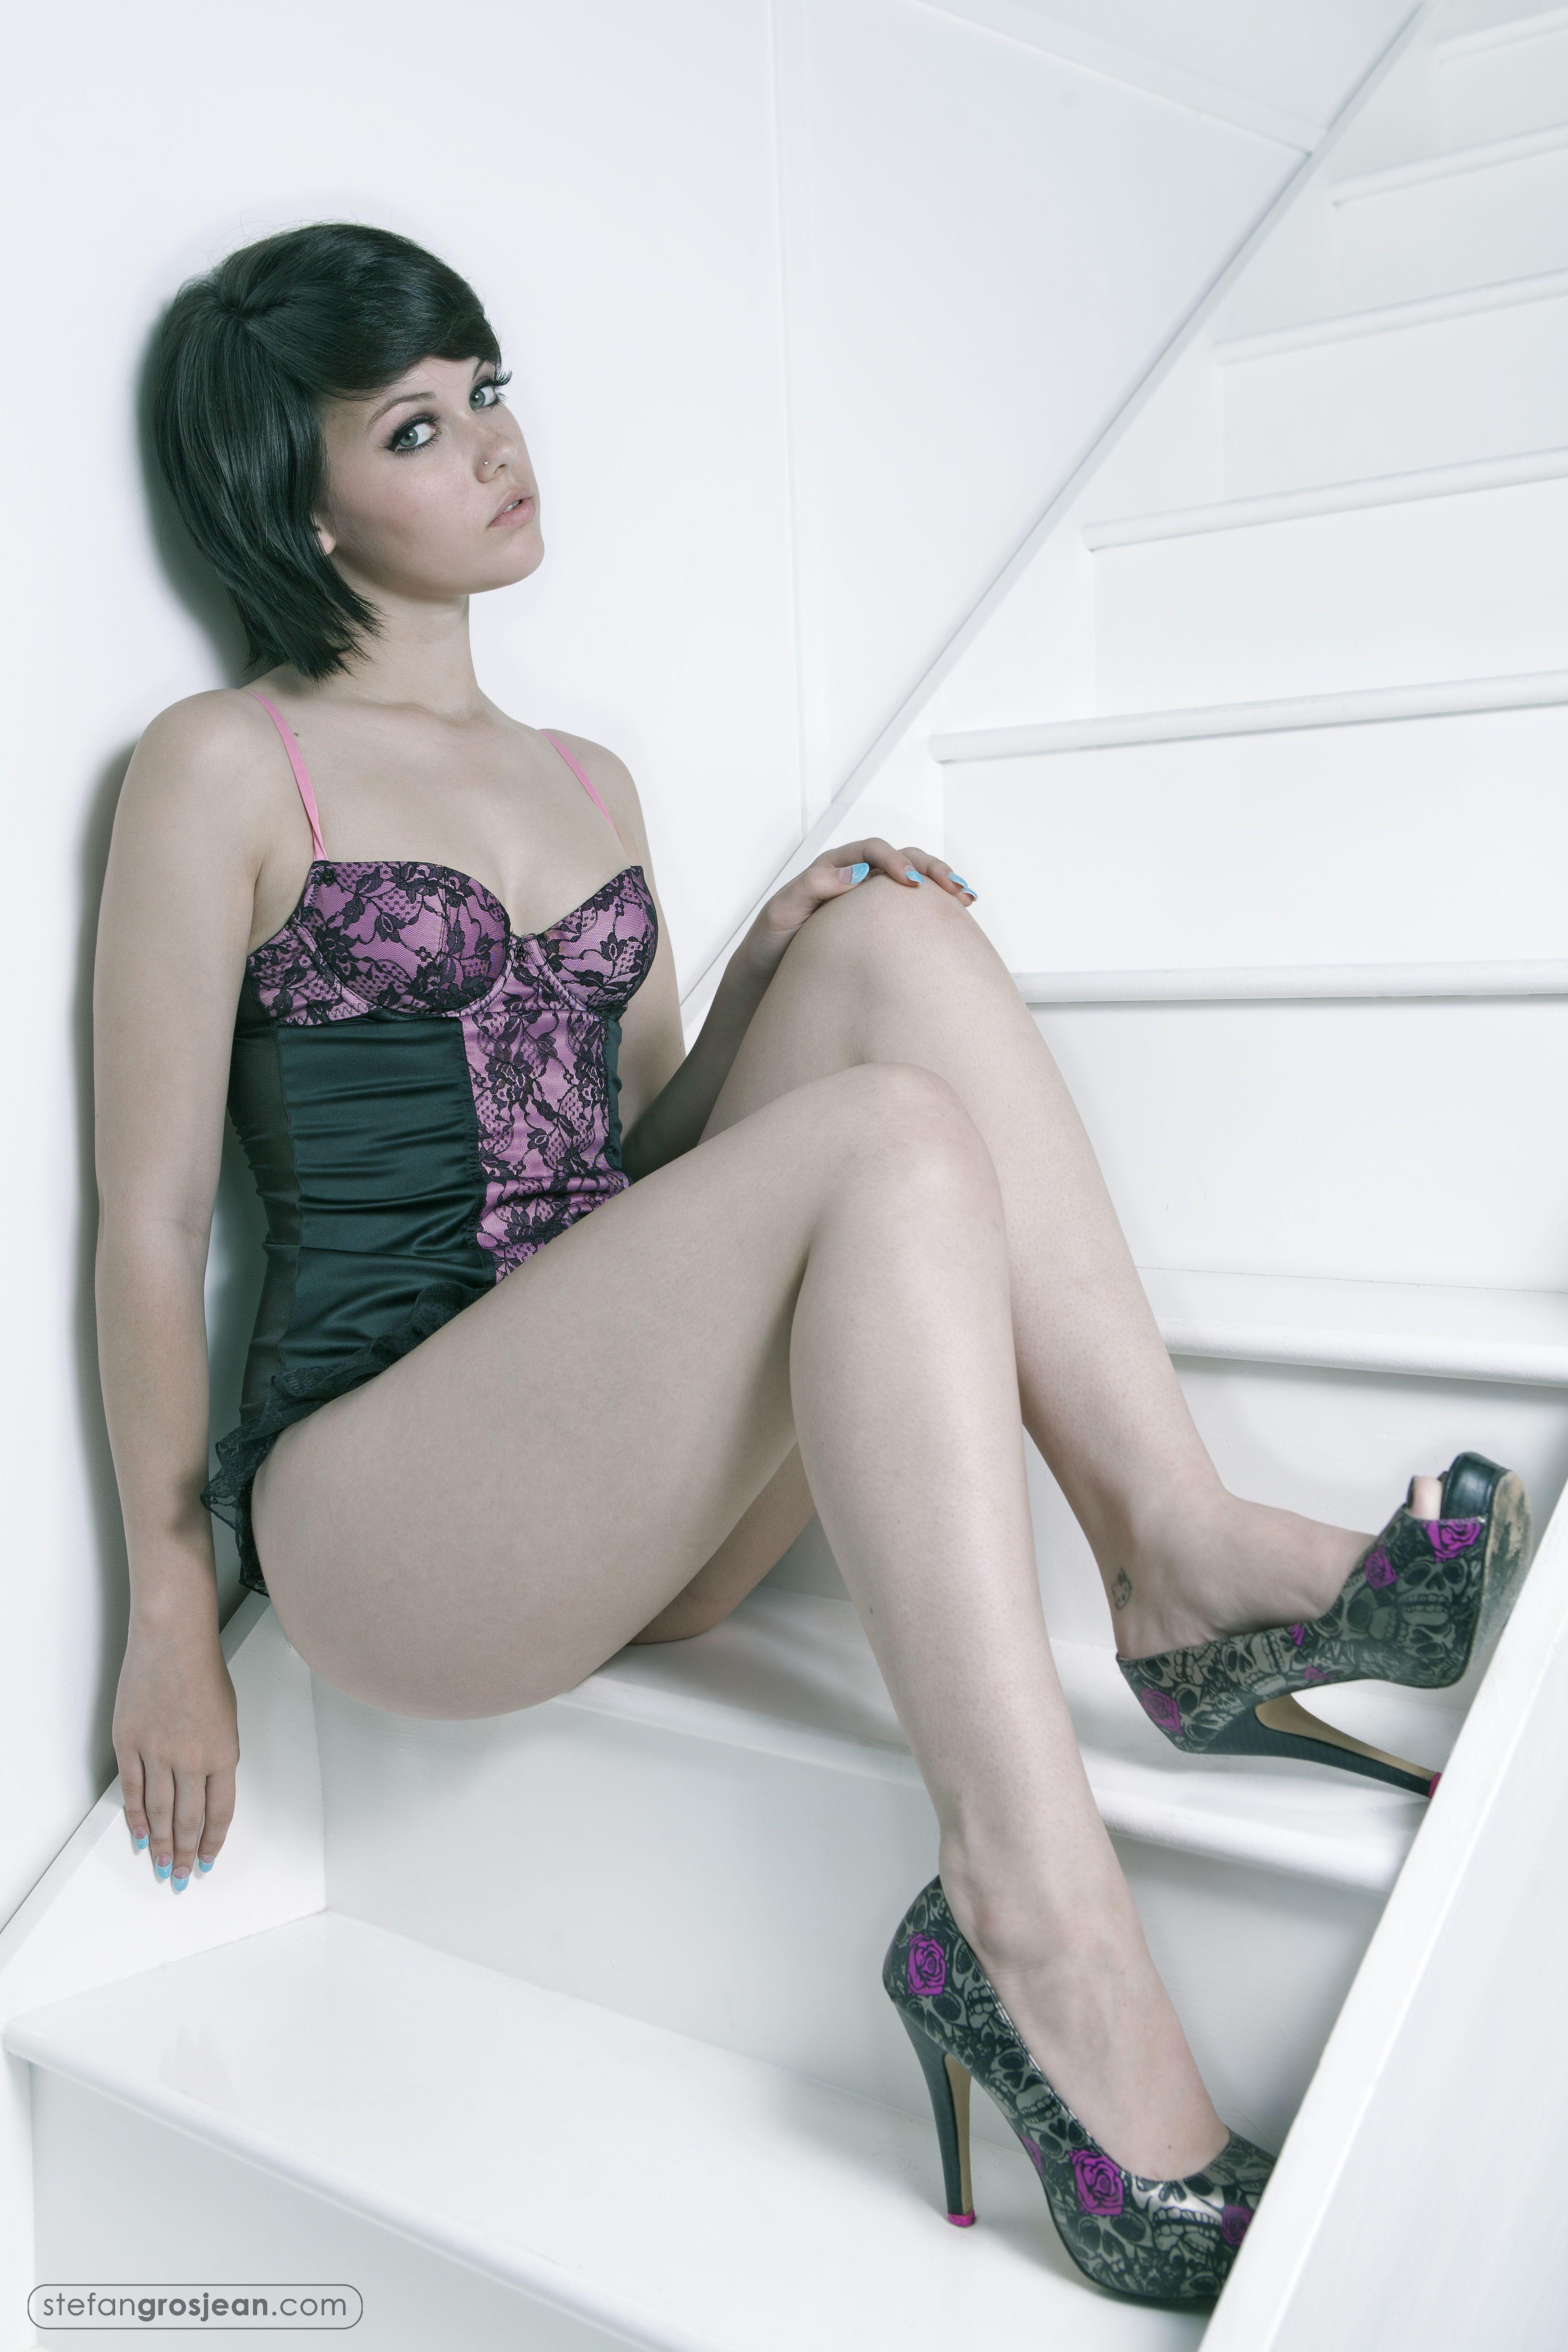 mellisa clarke | hot girls with tattoos | Pinterest